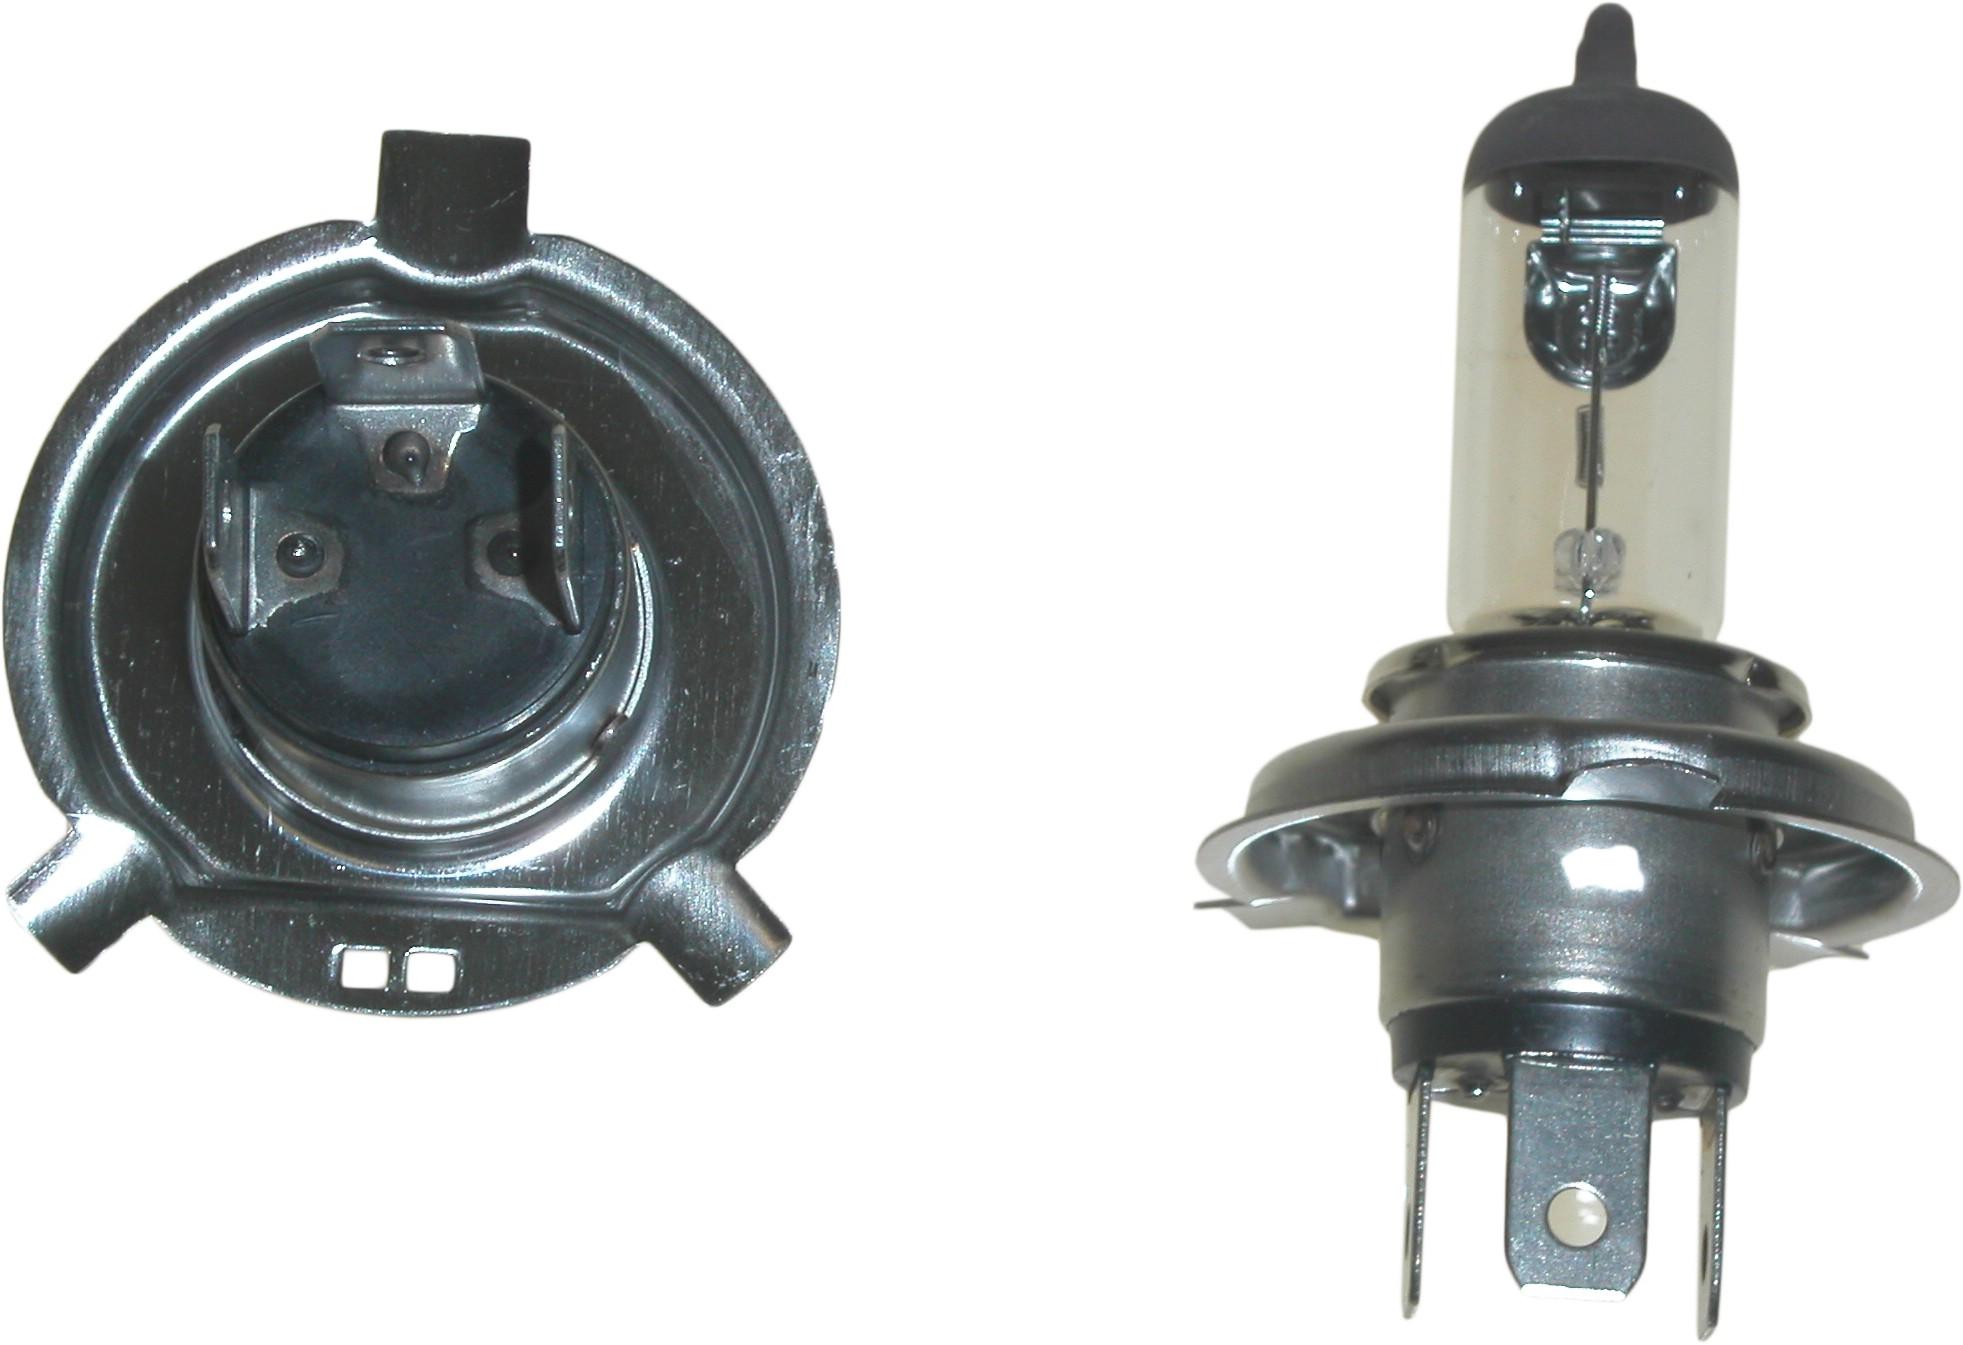 Suzuki GSF 650 Bandit (Naked/No ABS) (UK) 2005-2010 Headlight Bulb 1 (Per 10)